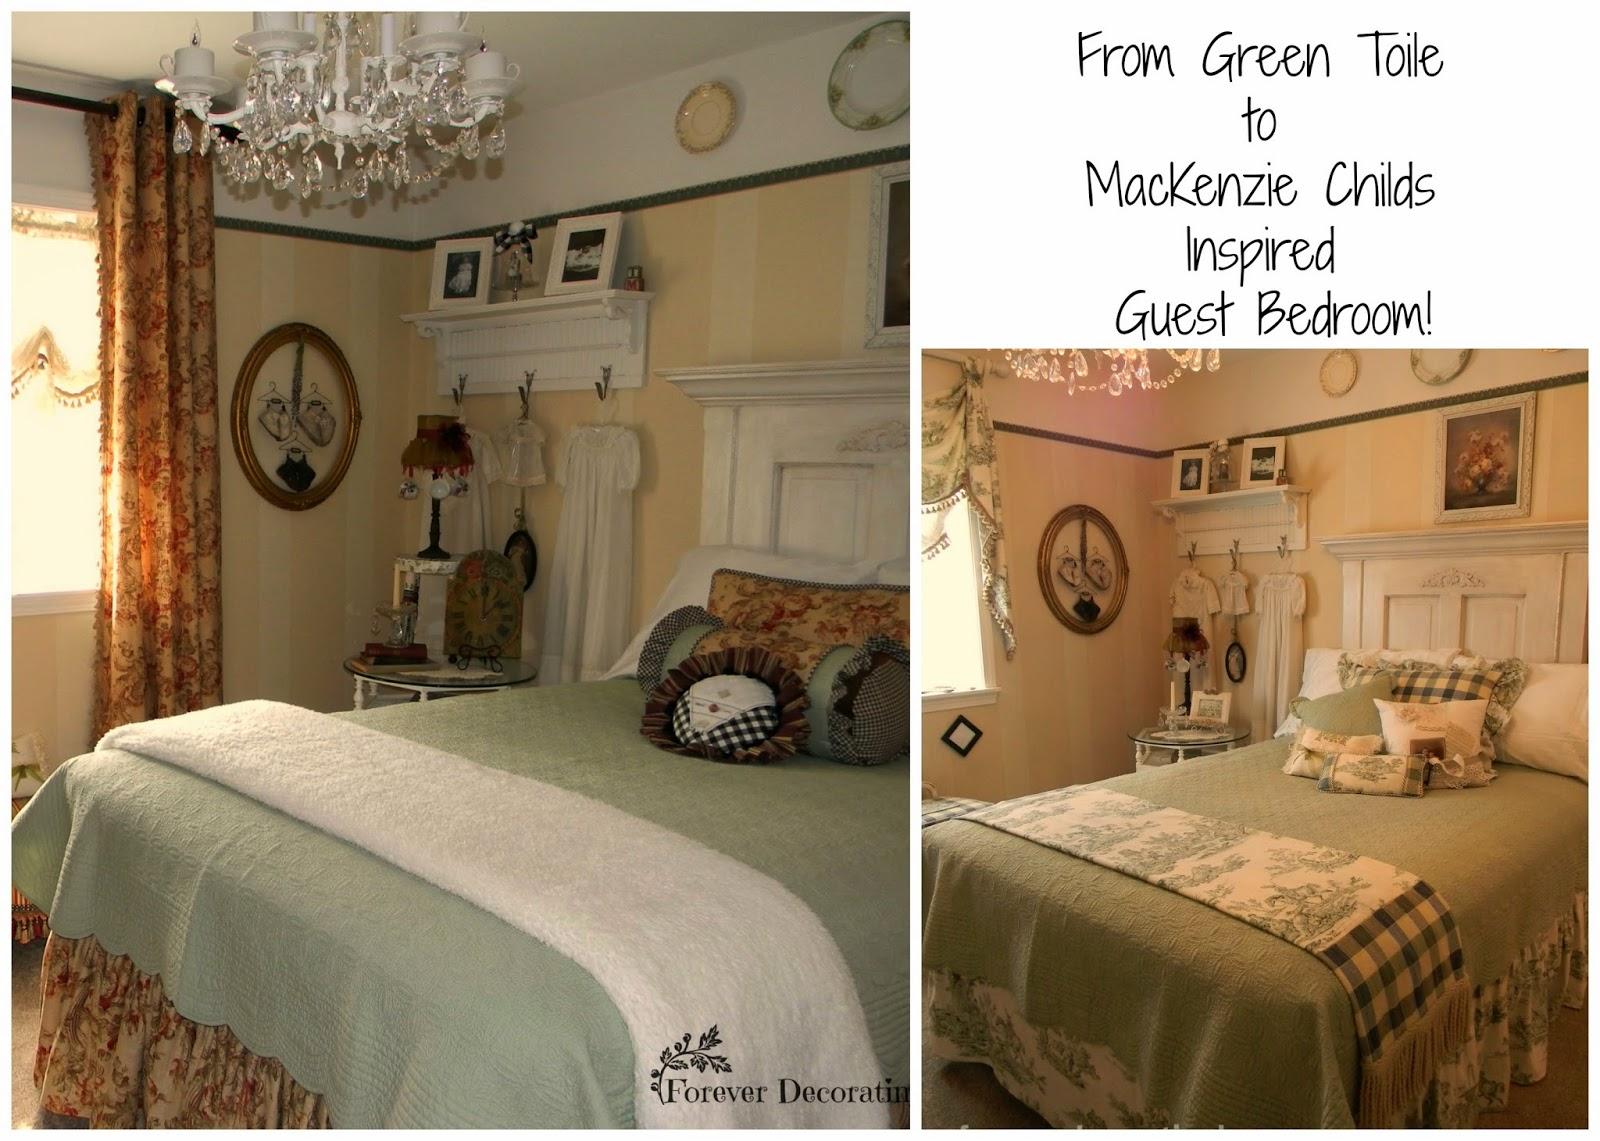 My MacKenzie Childs Inspired Guest Bedroom!